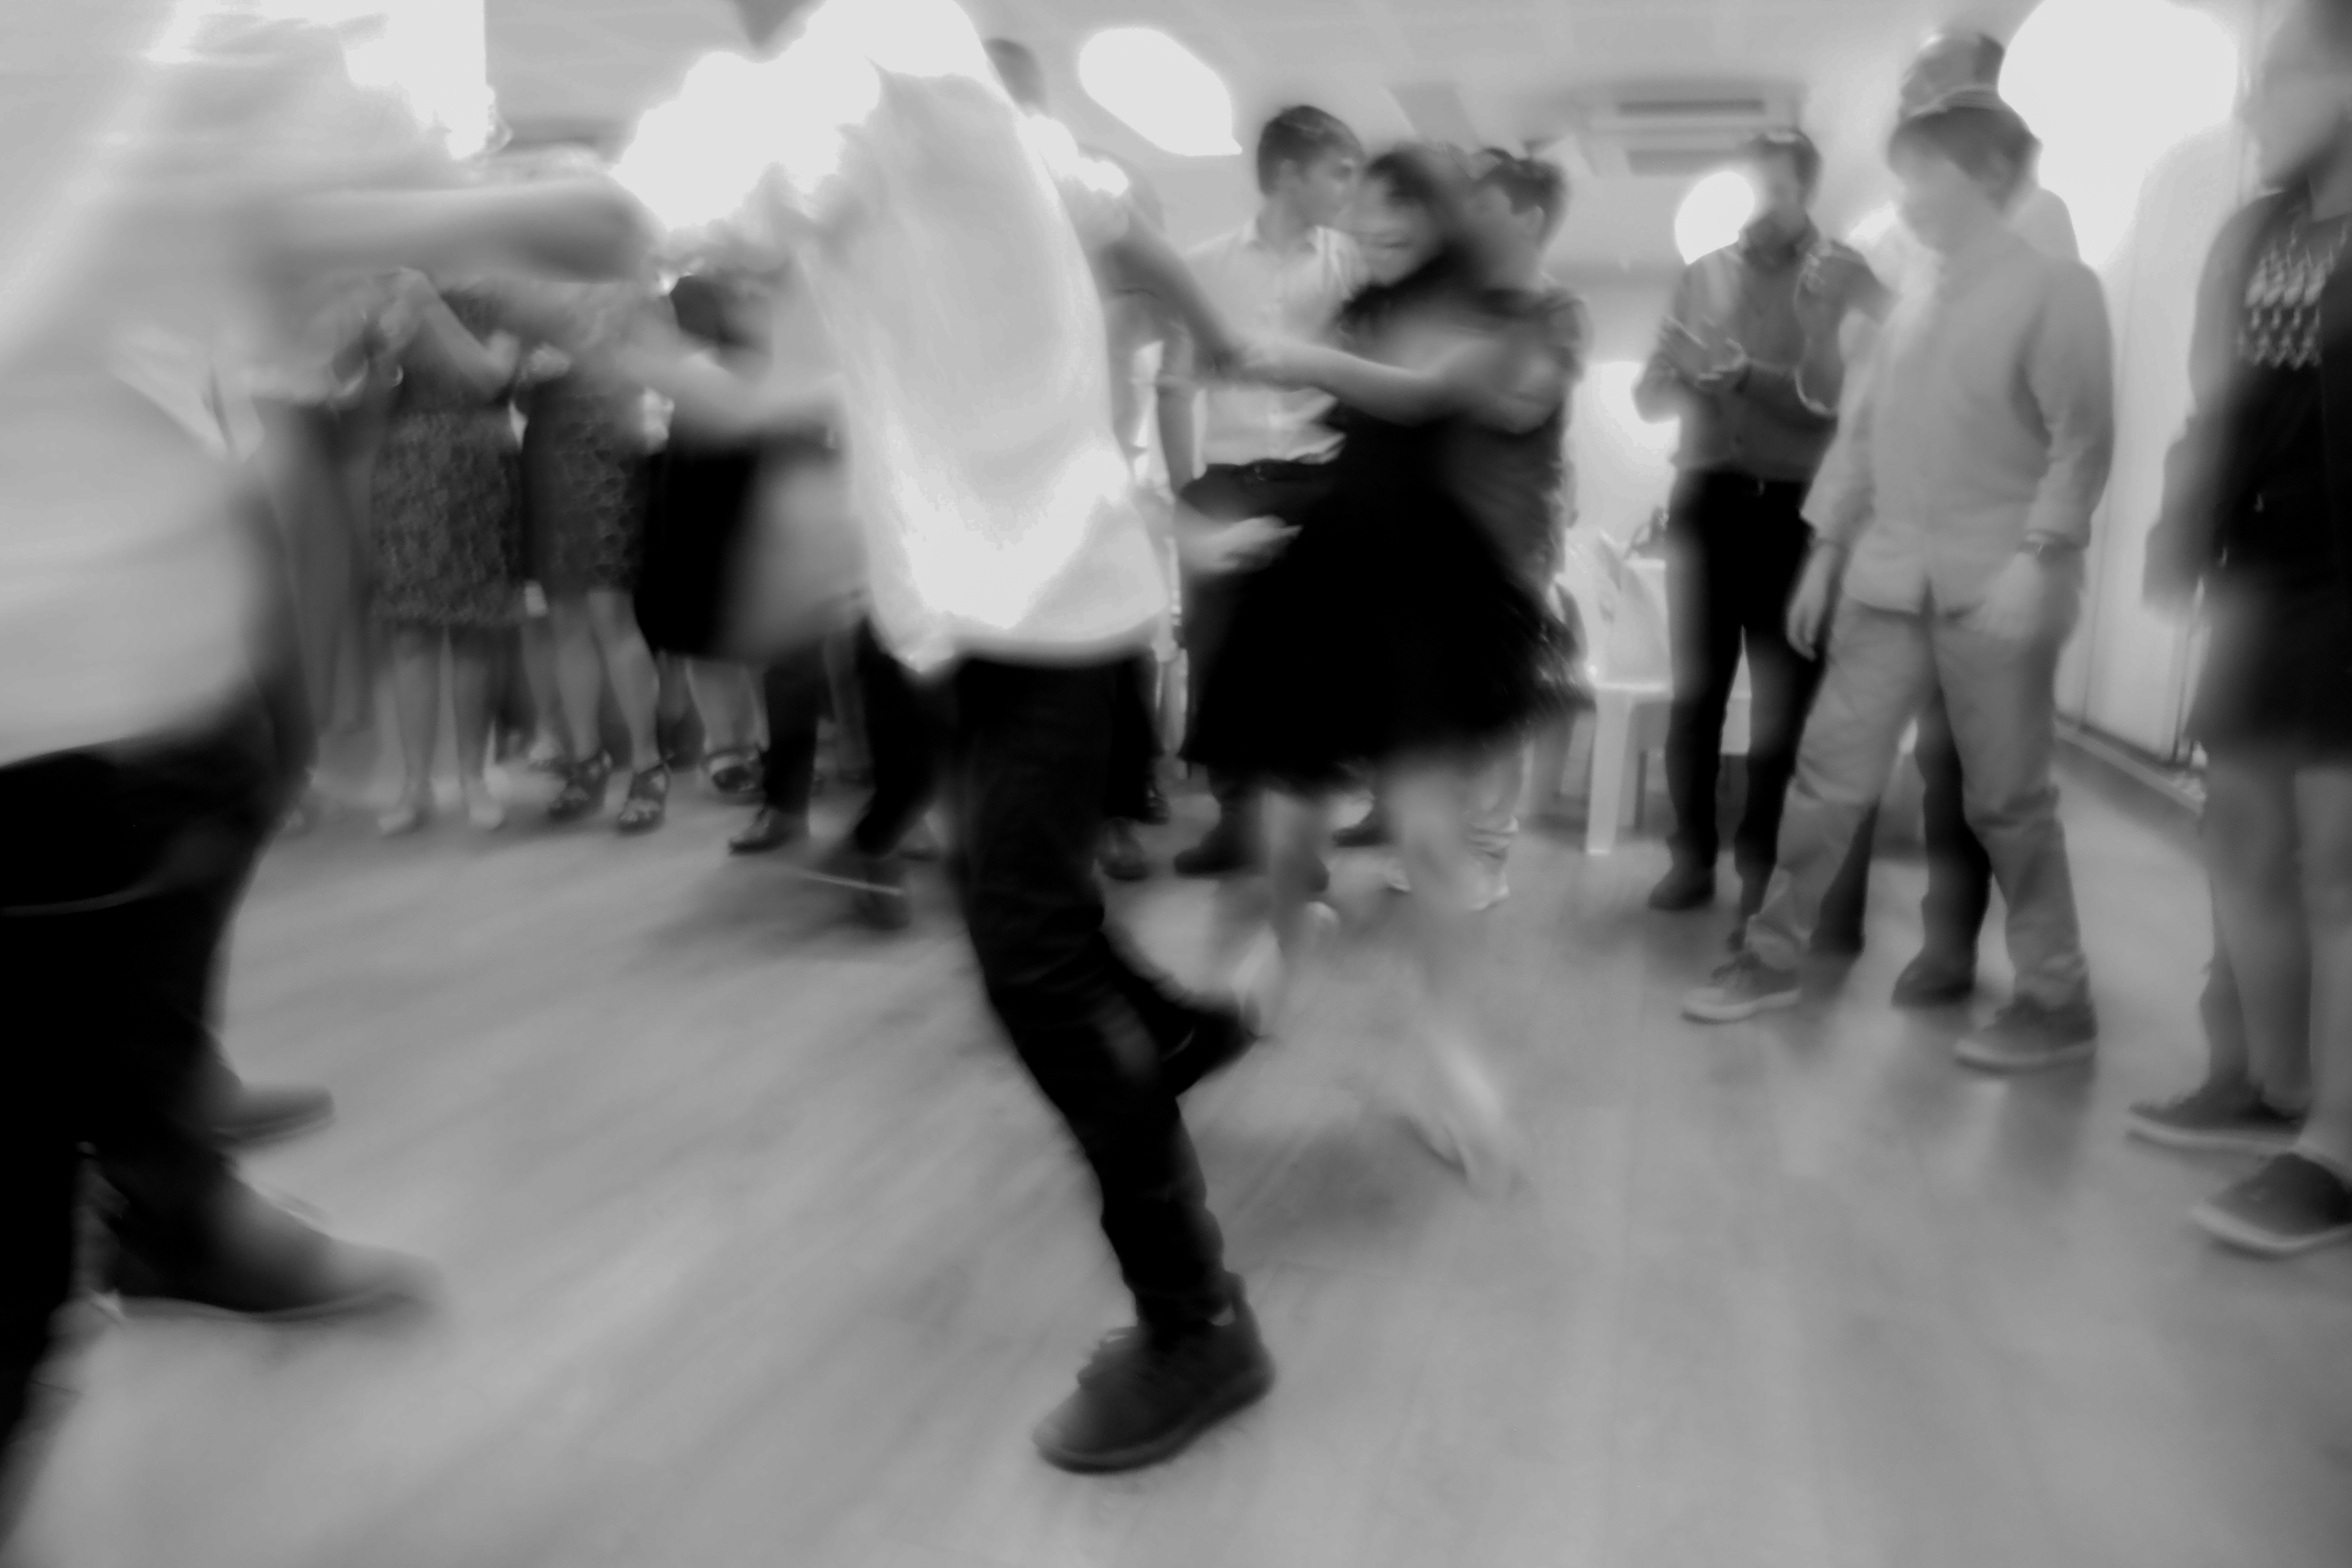 The Dance - Bar mitzvah